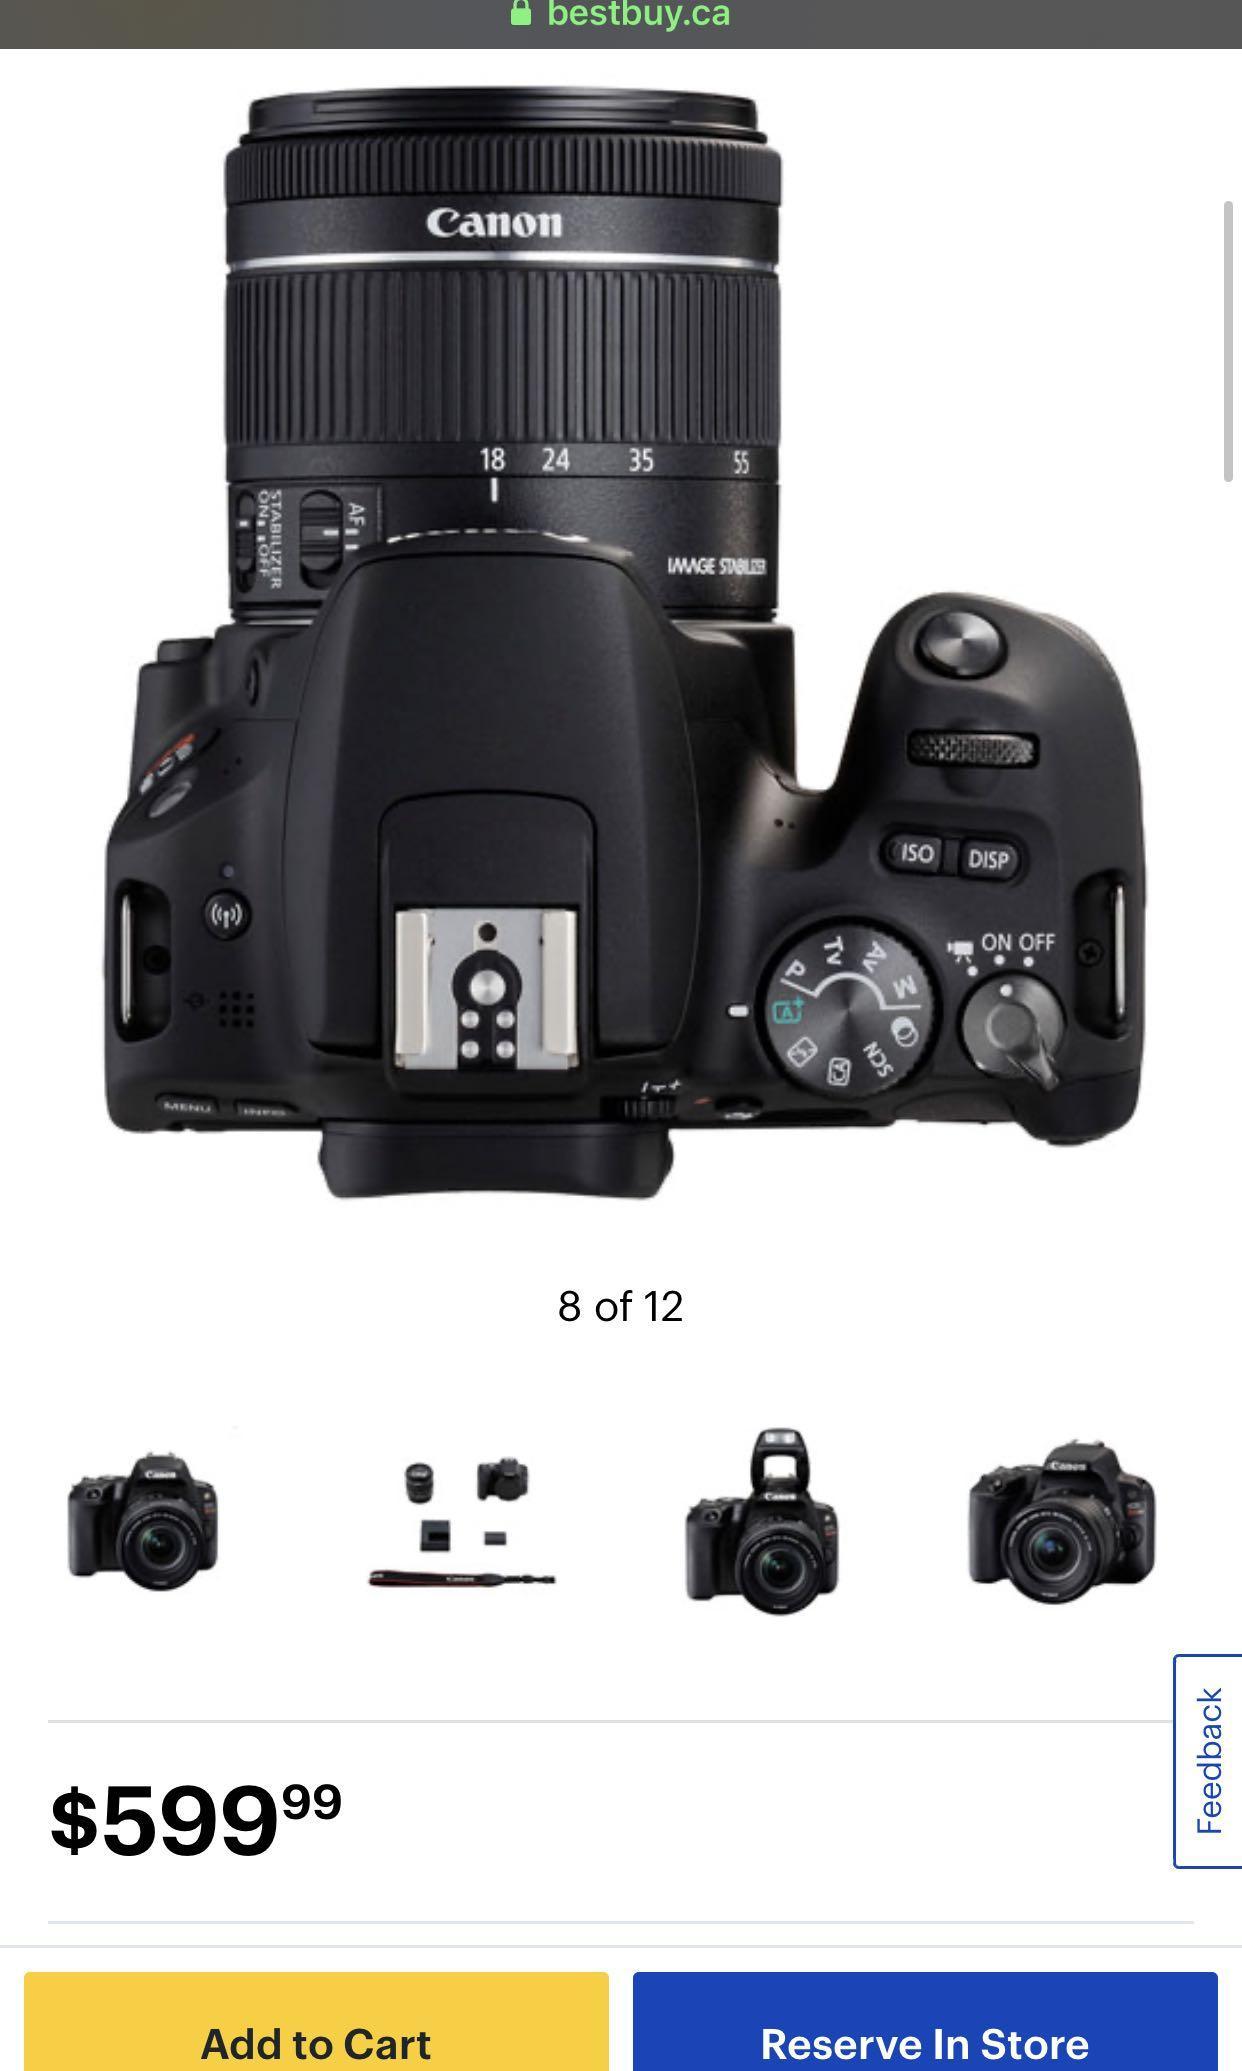 Canon EOS 1100d/t3 12.2 MpDigital Slr with 18-55mm Lens Kit